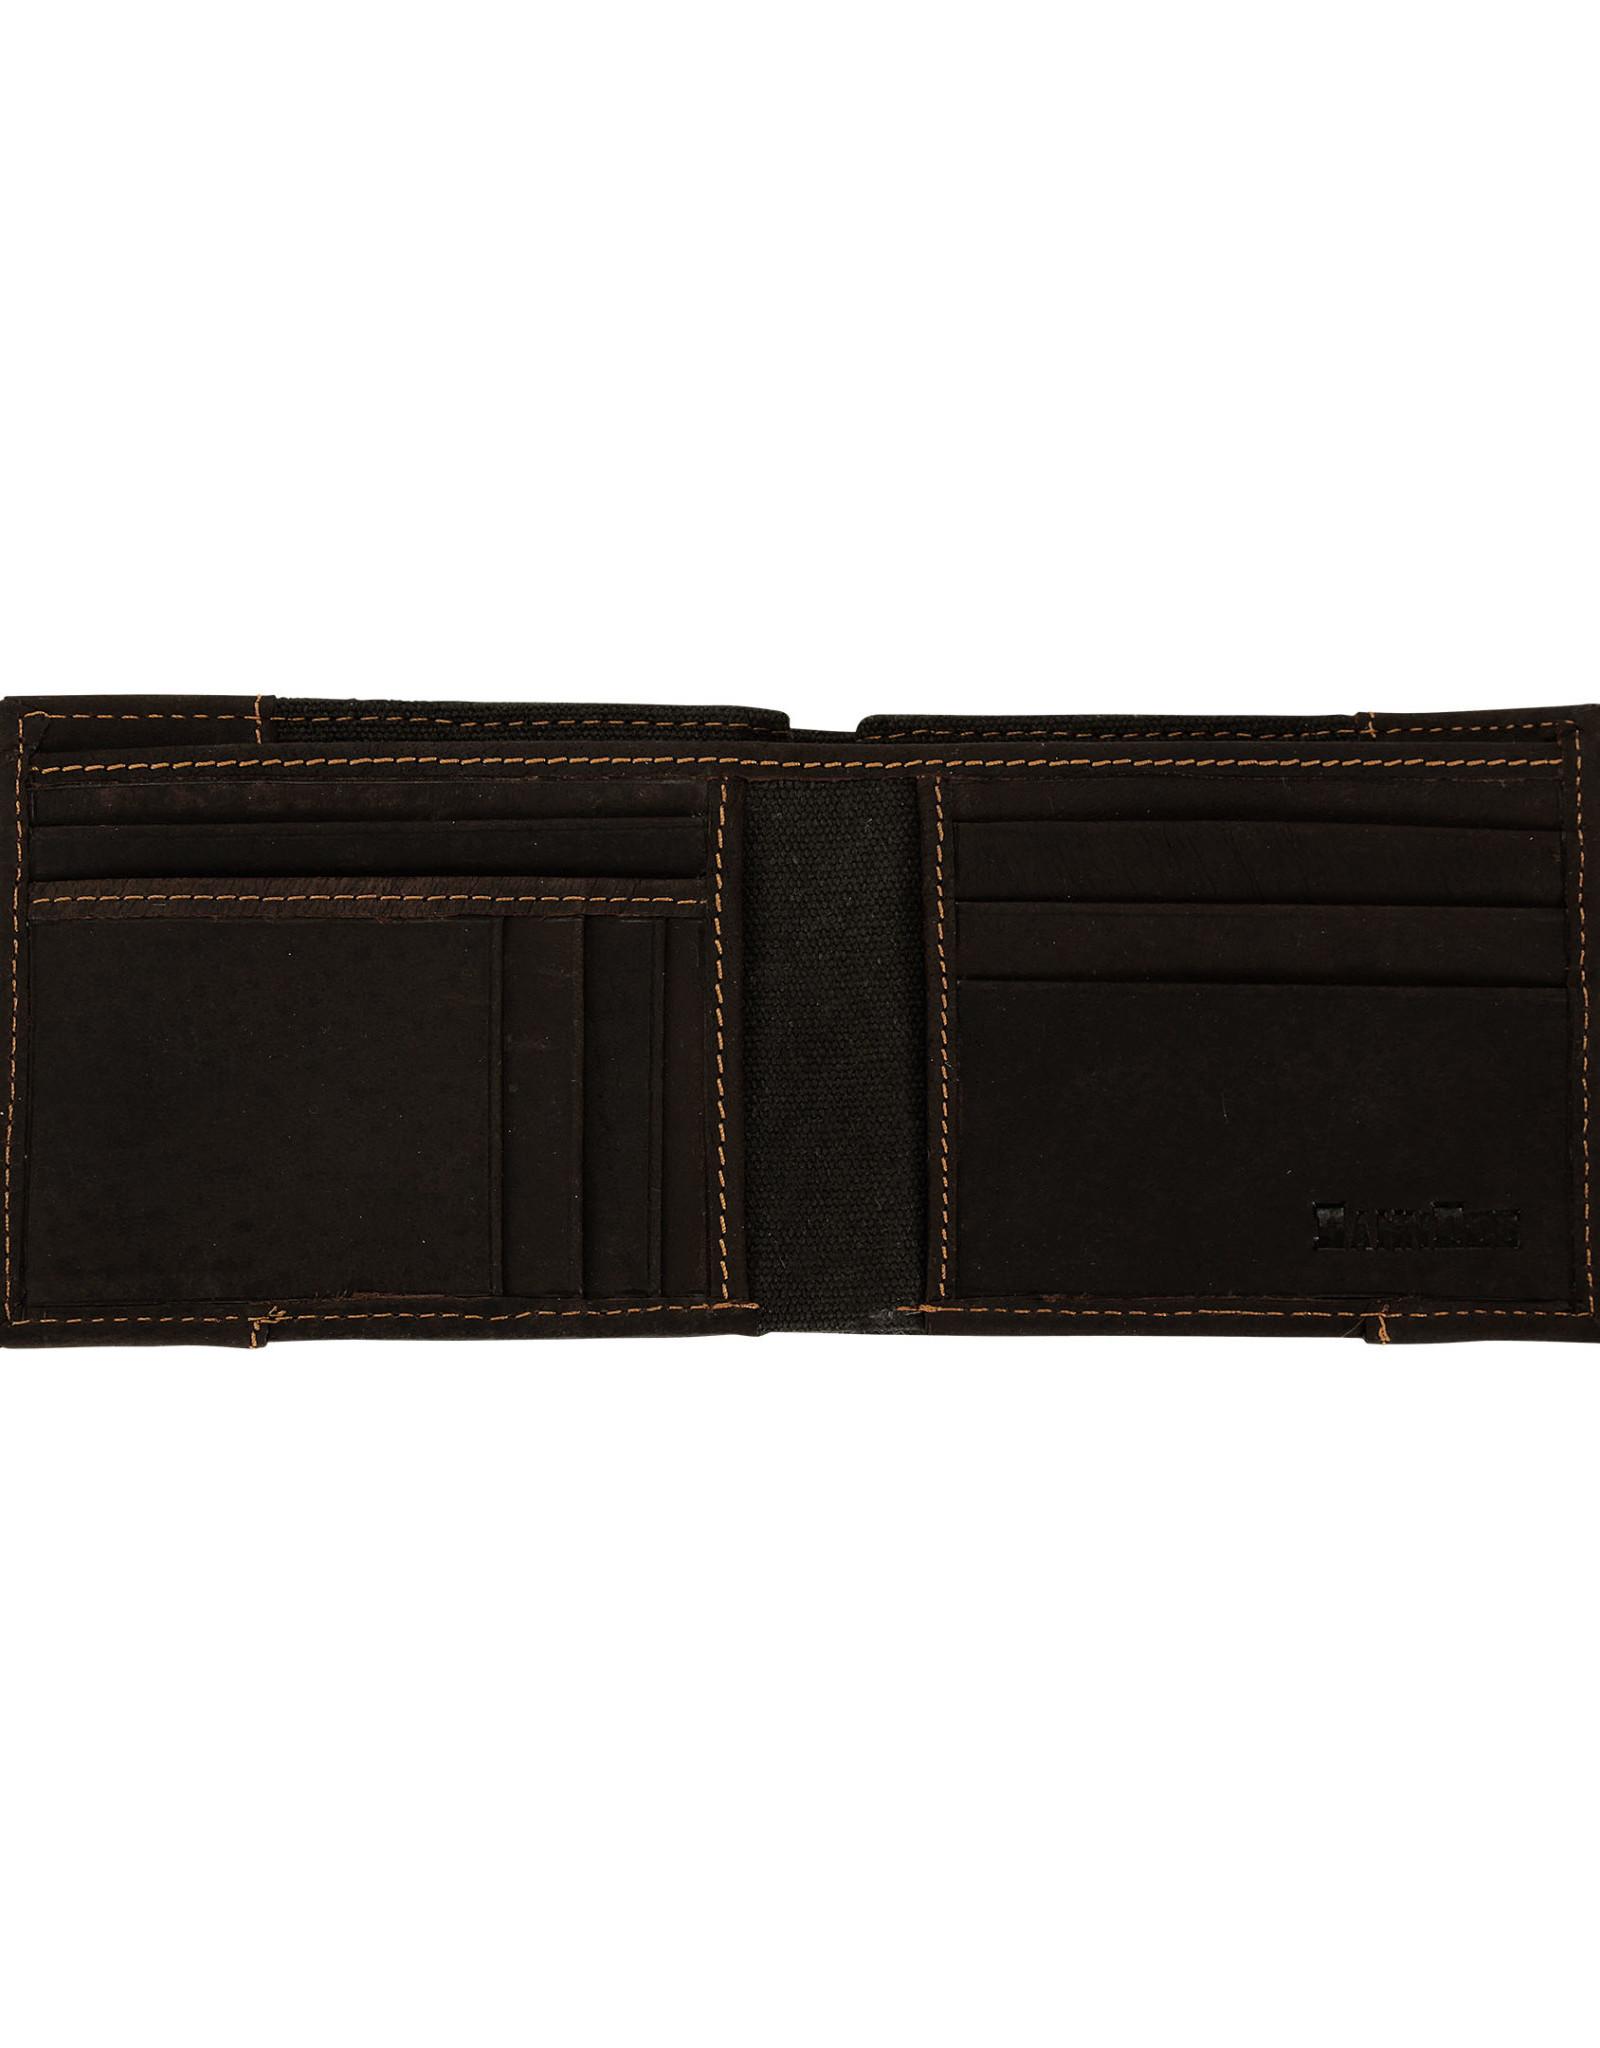 DAMNDOG Canvas and Leather Billfold Wallet - Grey